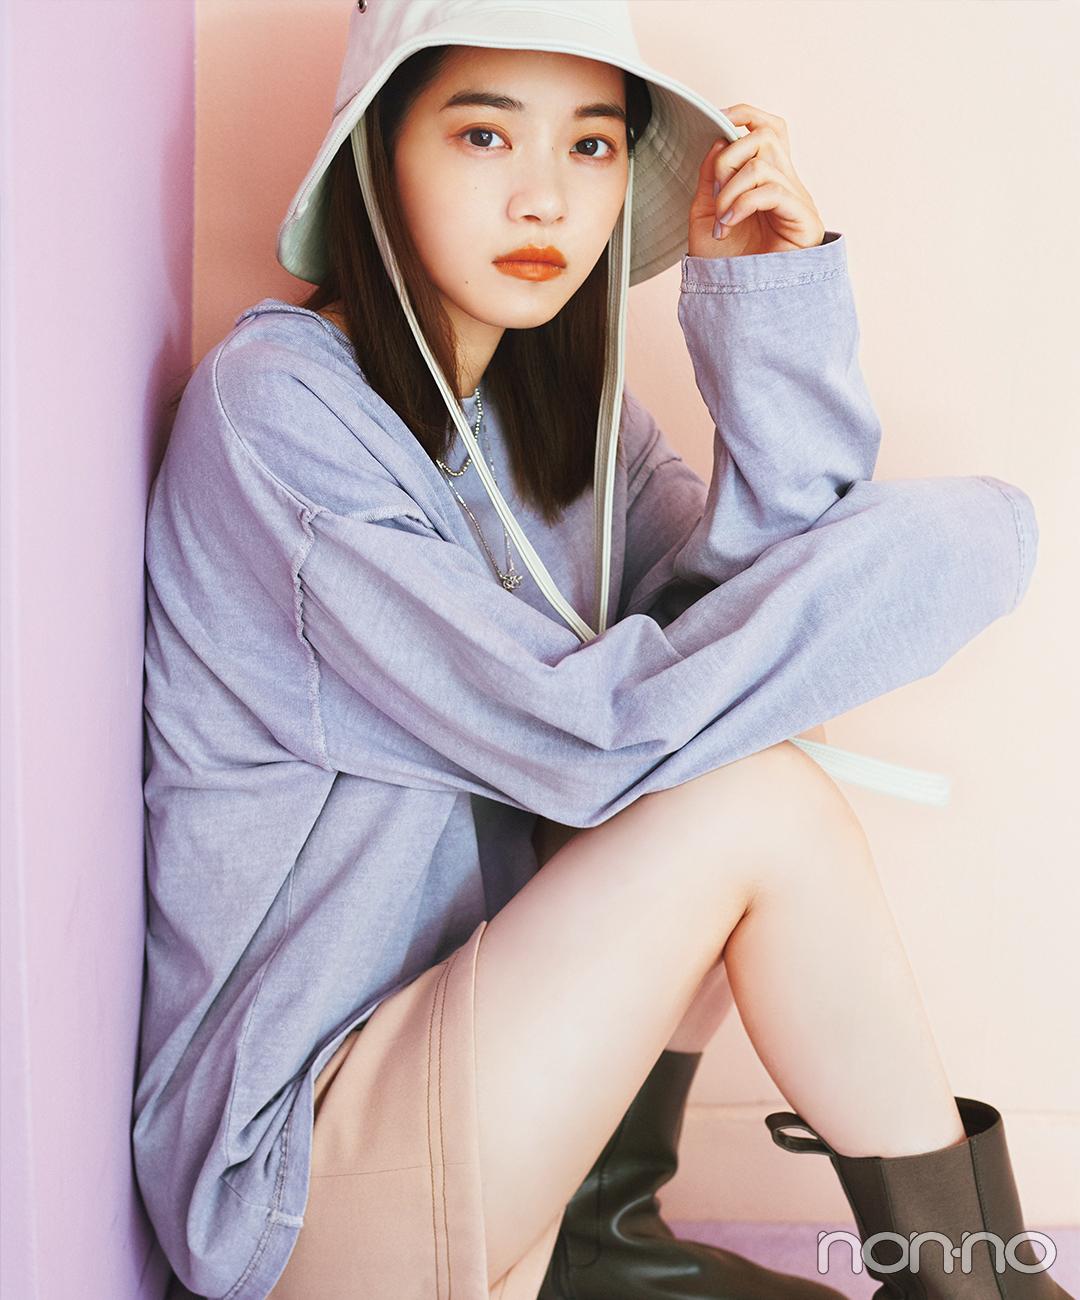 Photo Gallery|モデル・西野七瀬の最新フォトギャラリーを見る_1_9